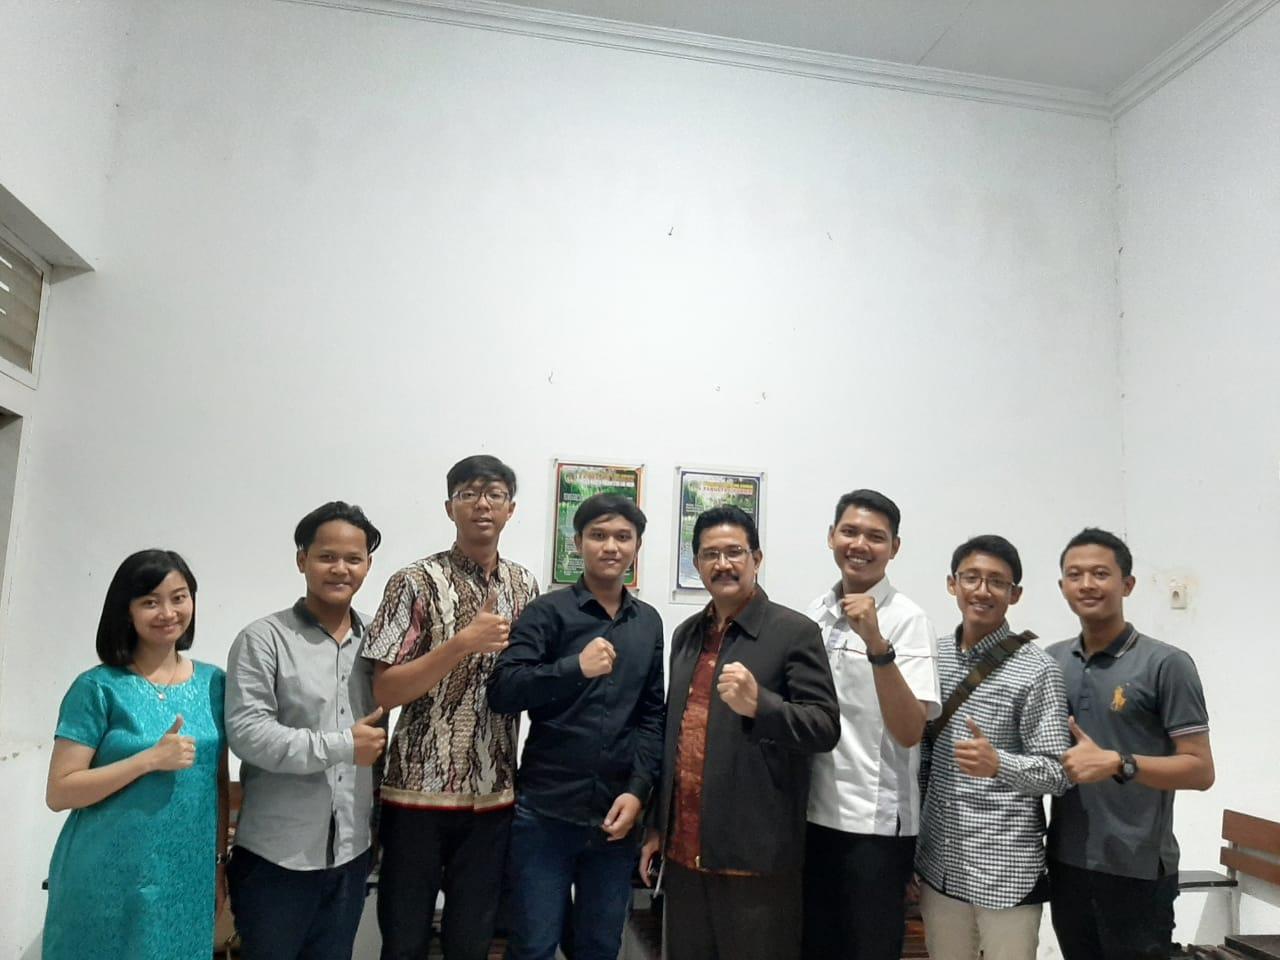 Dr. Bambang Joyo Supeno, S.H., M.Hum.